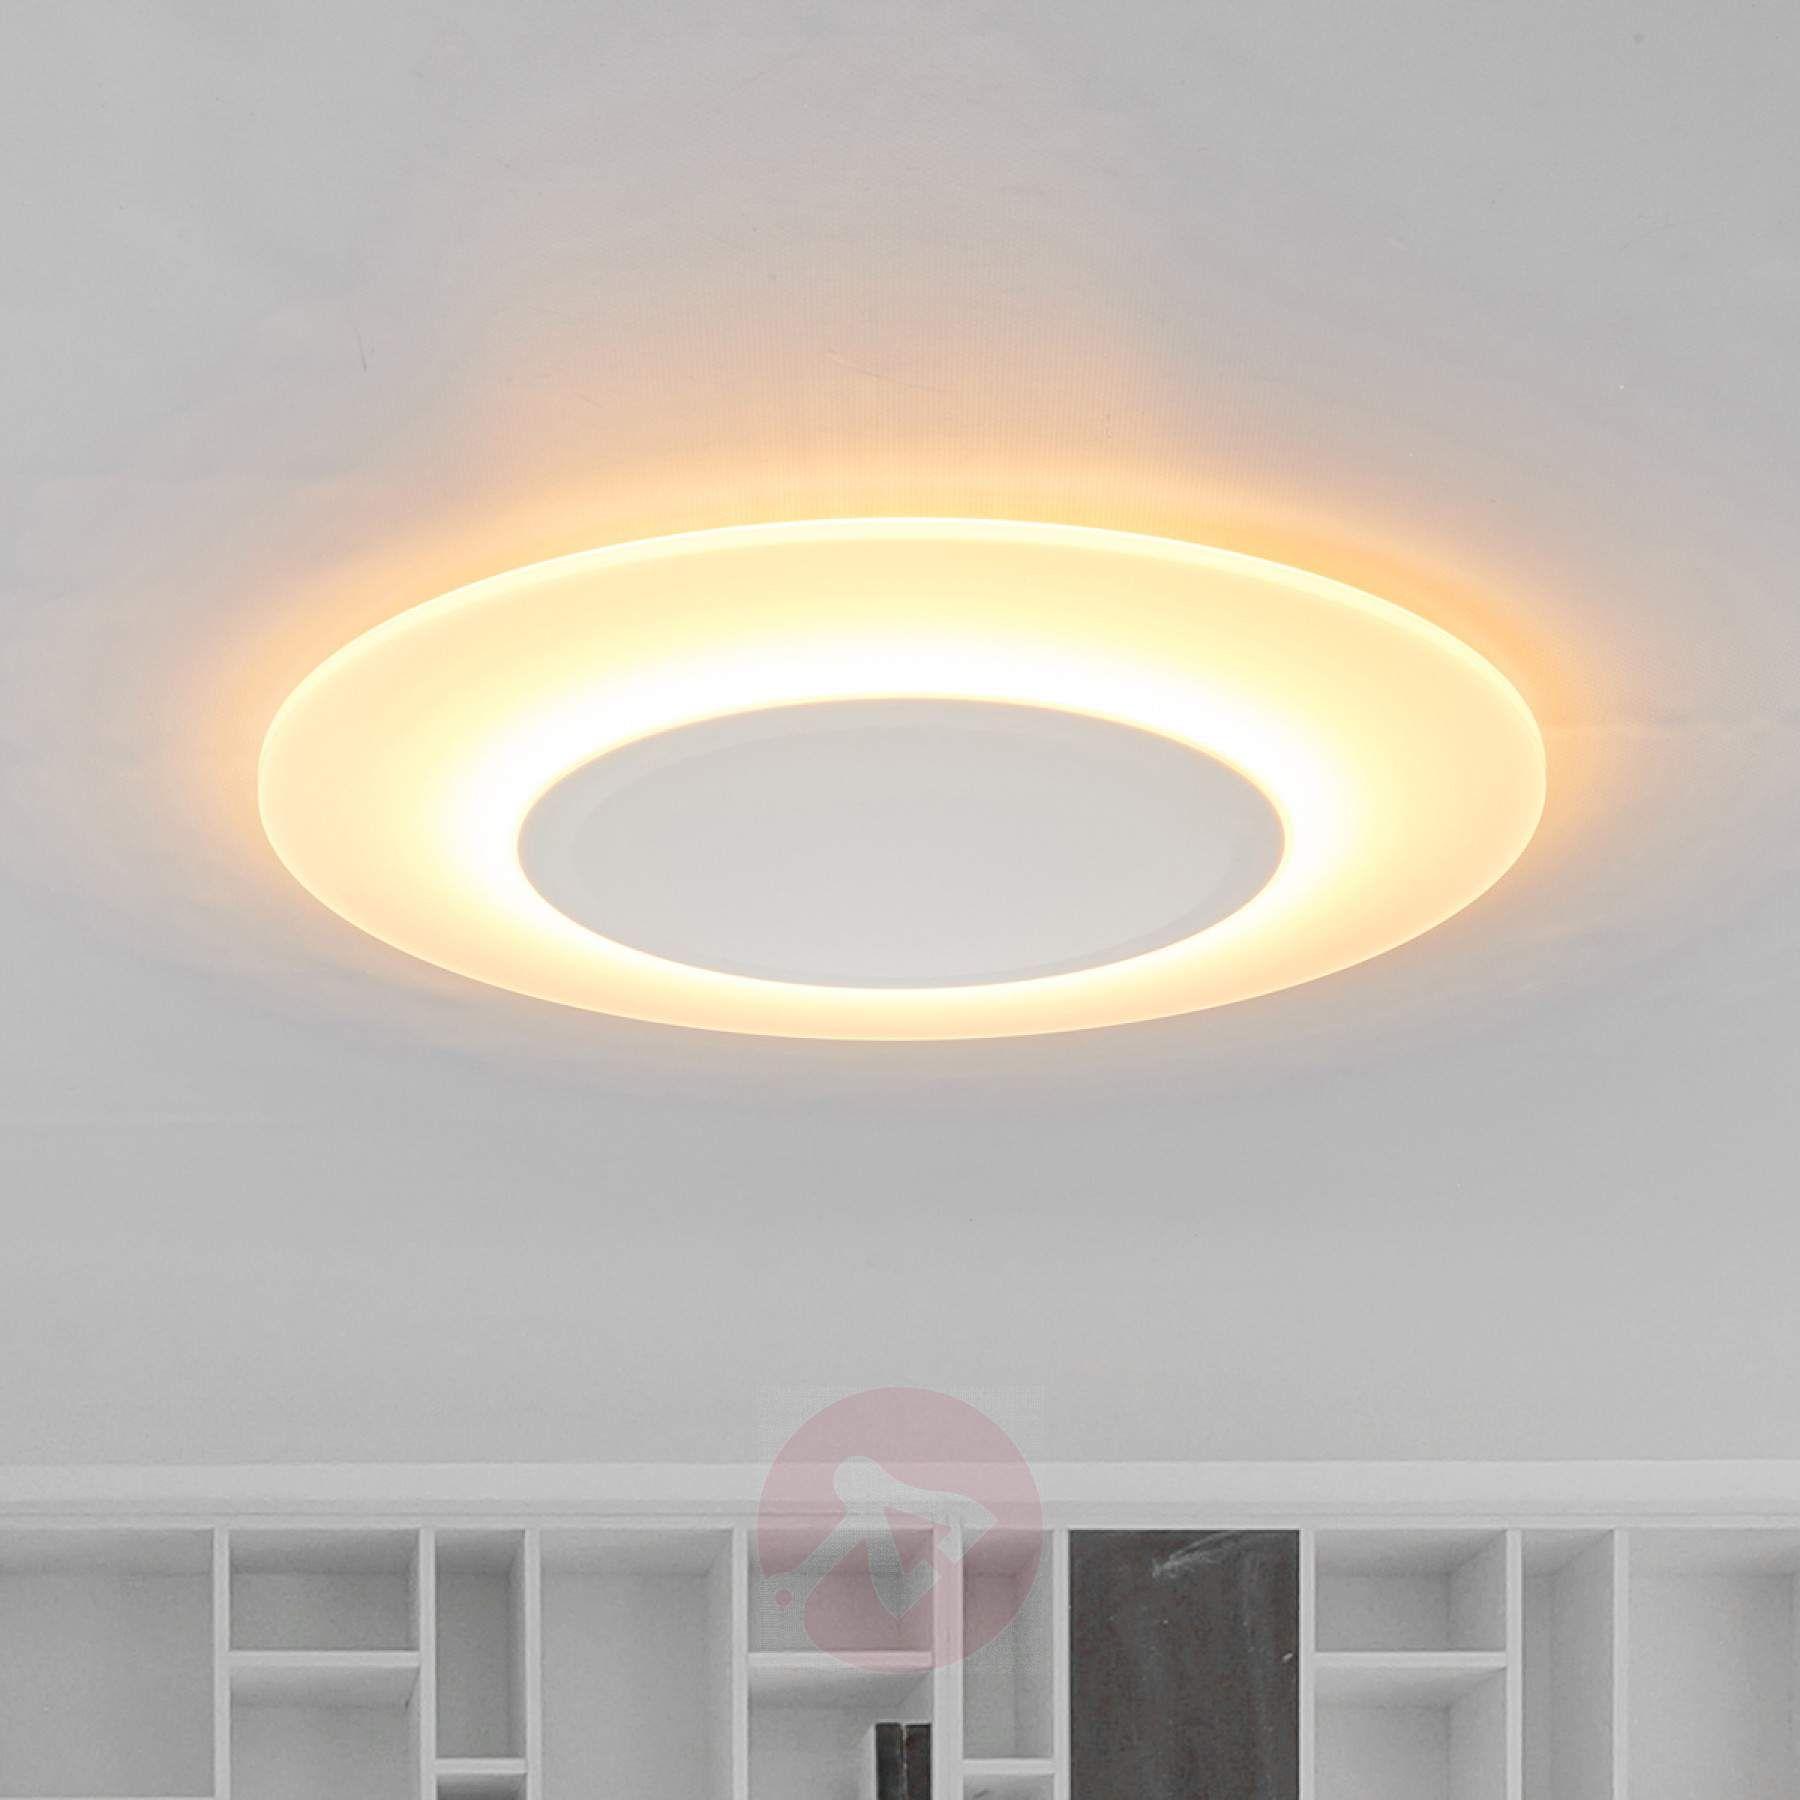 Very Flat Ceiling Light Led Flat 1 200 Lumens Lights Co Uk